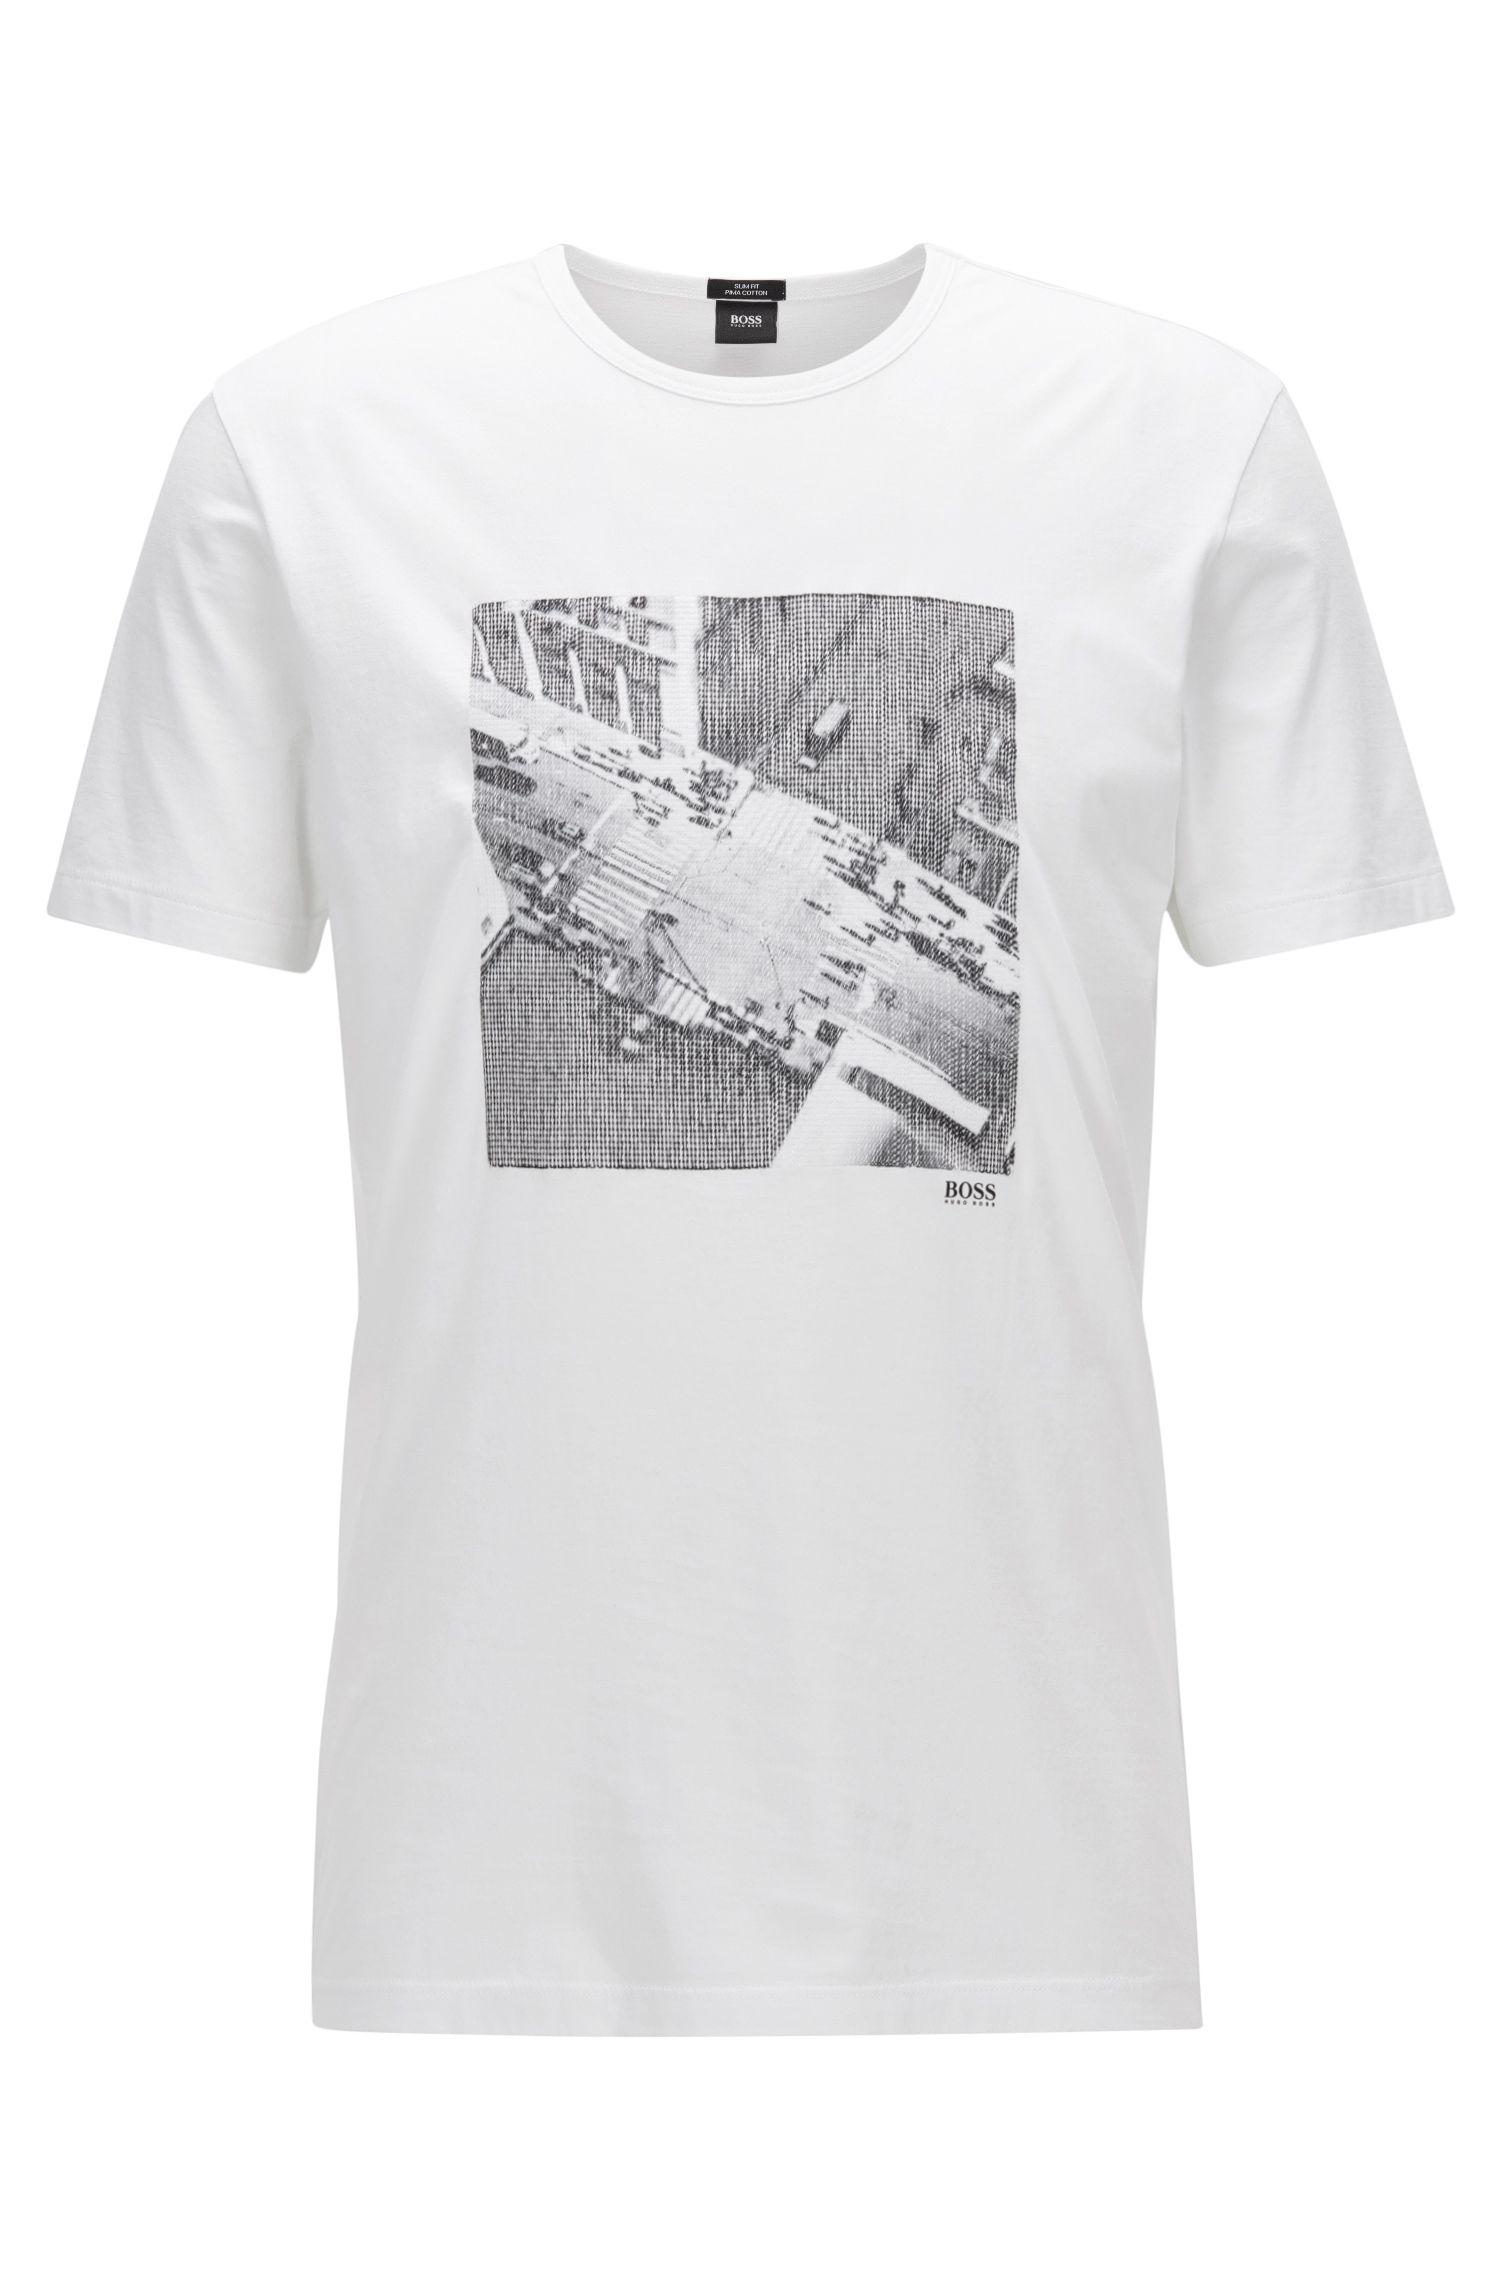 Cotton Graphic T-Shirt | Tessler